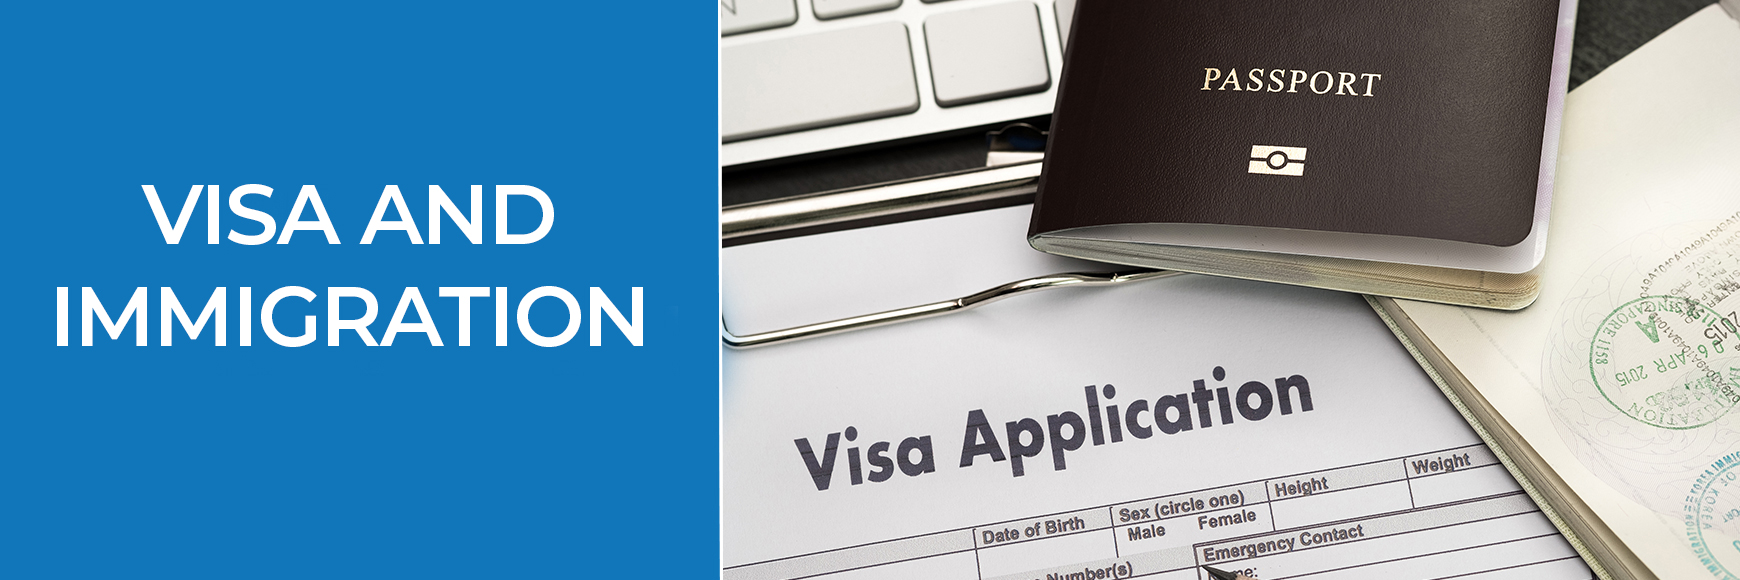 Visa and Inmigration Banner - Orlando Homes Sales